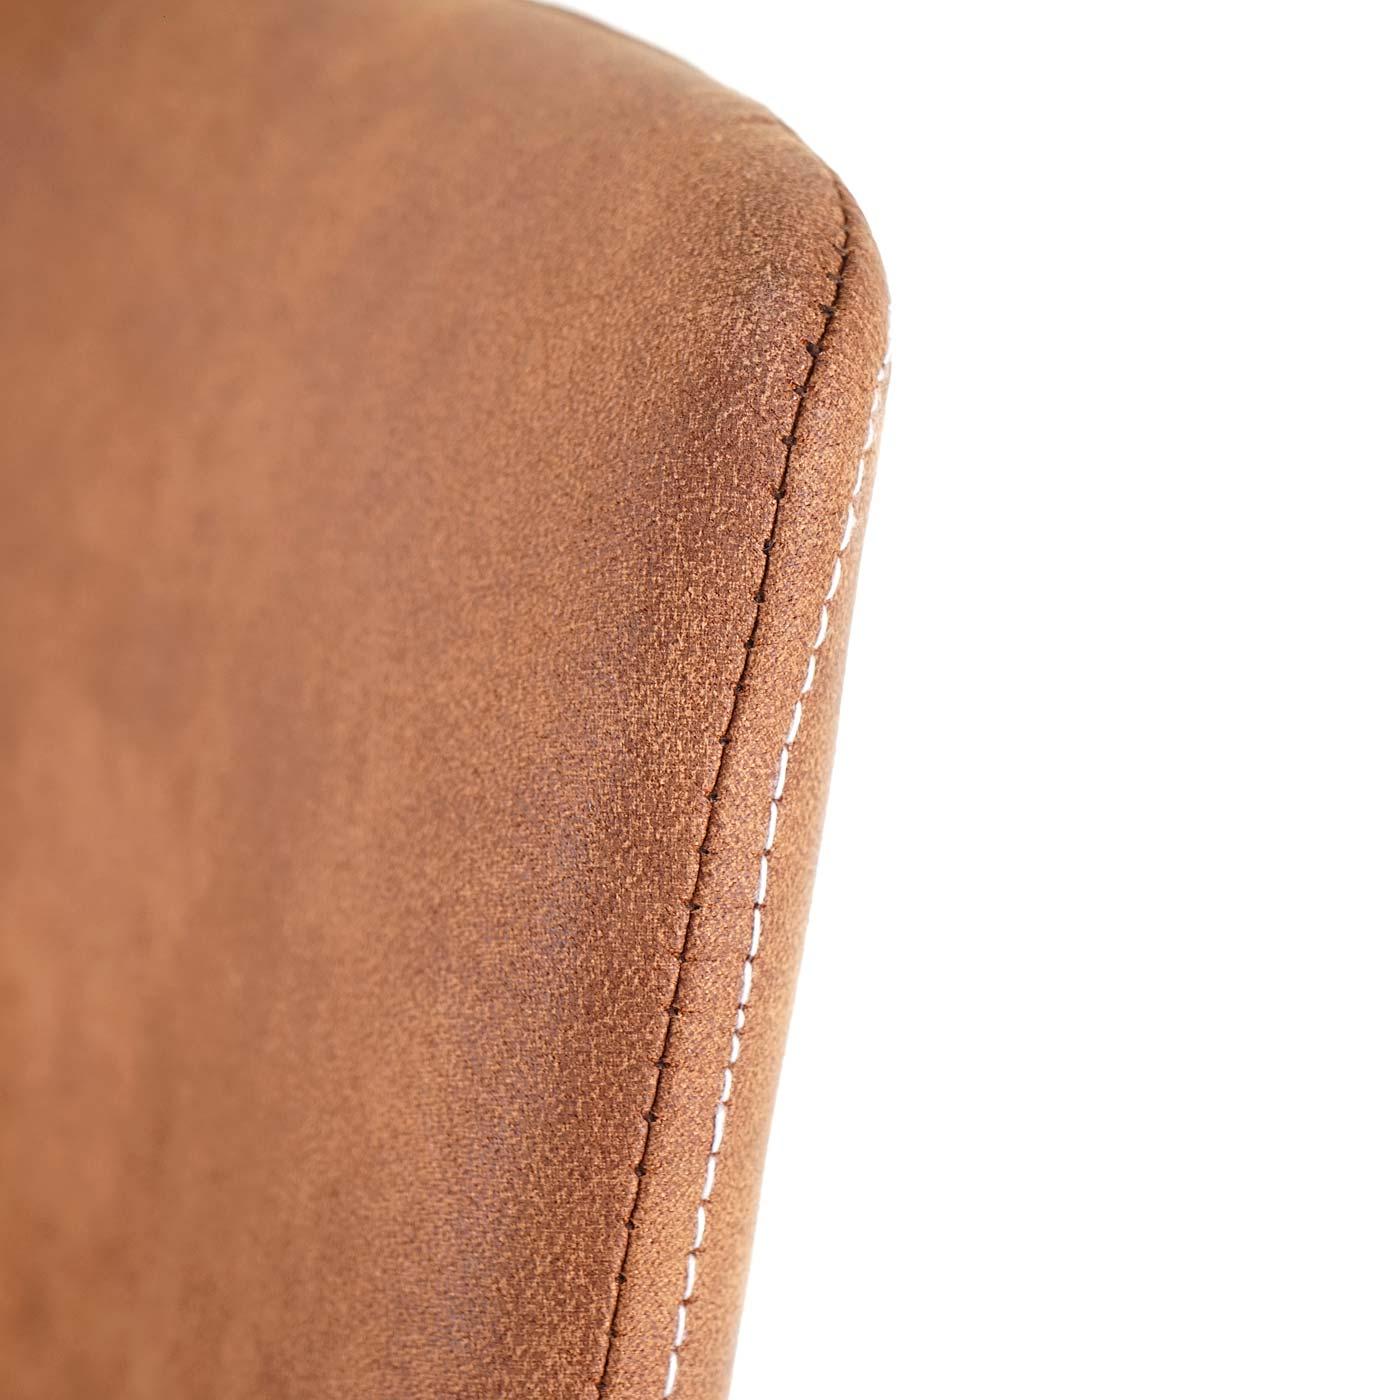 2x Barhocker Mcw D70 Vintage Wildlederimitat Stoff Textil Barstuhl Barkrukken Stoelen Huis Workbenchprojects Com